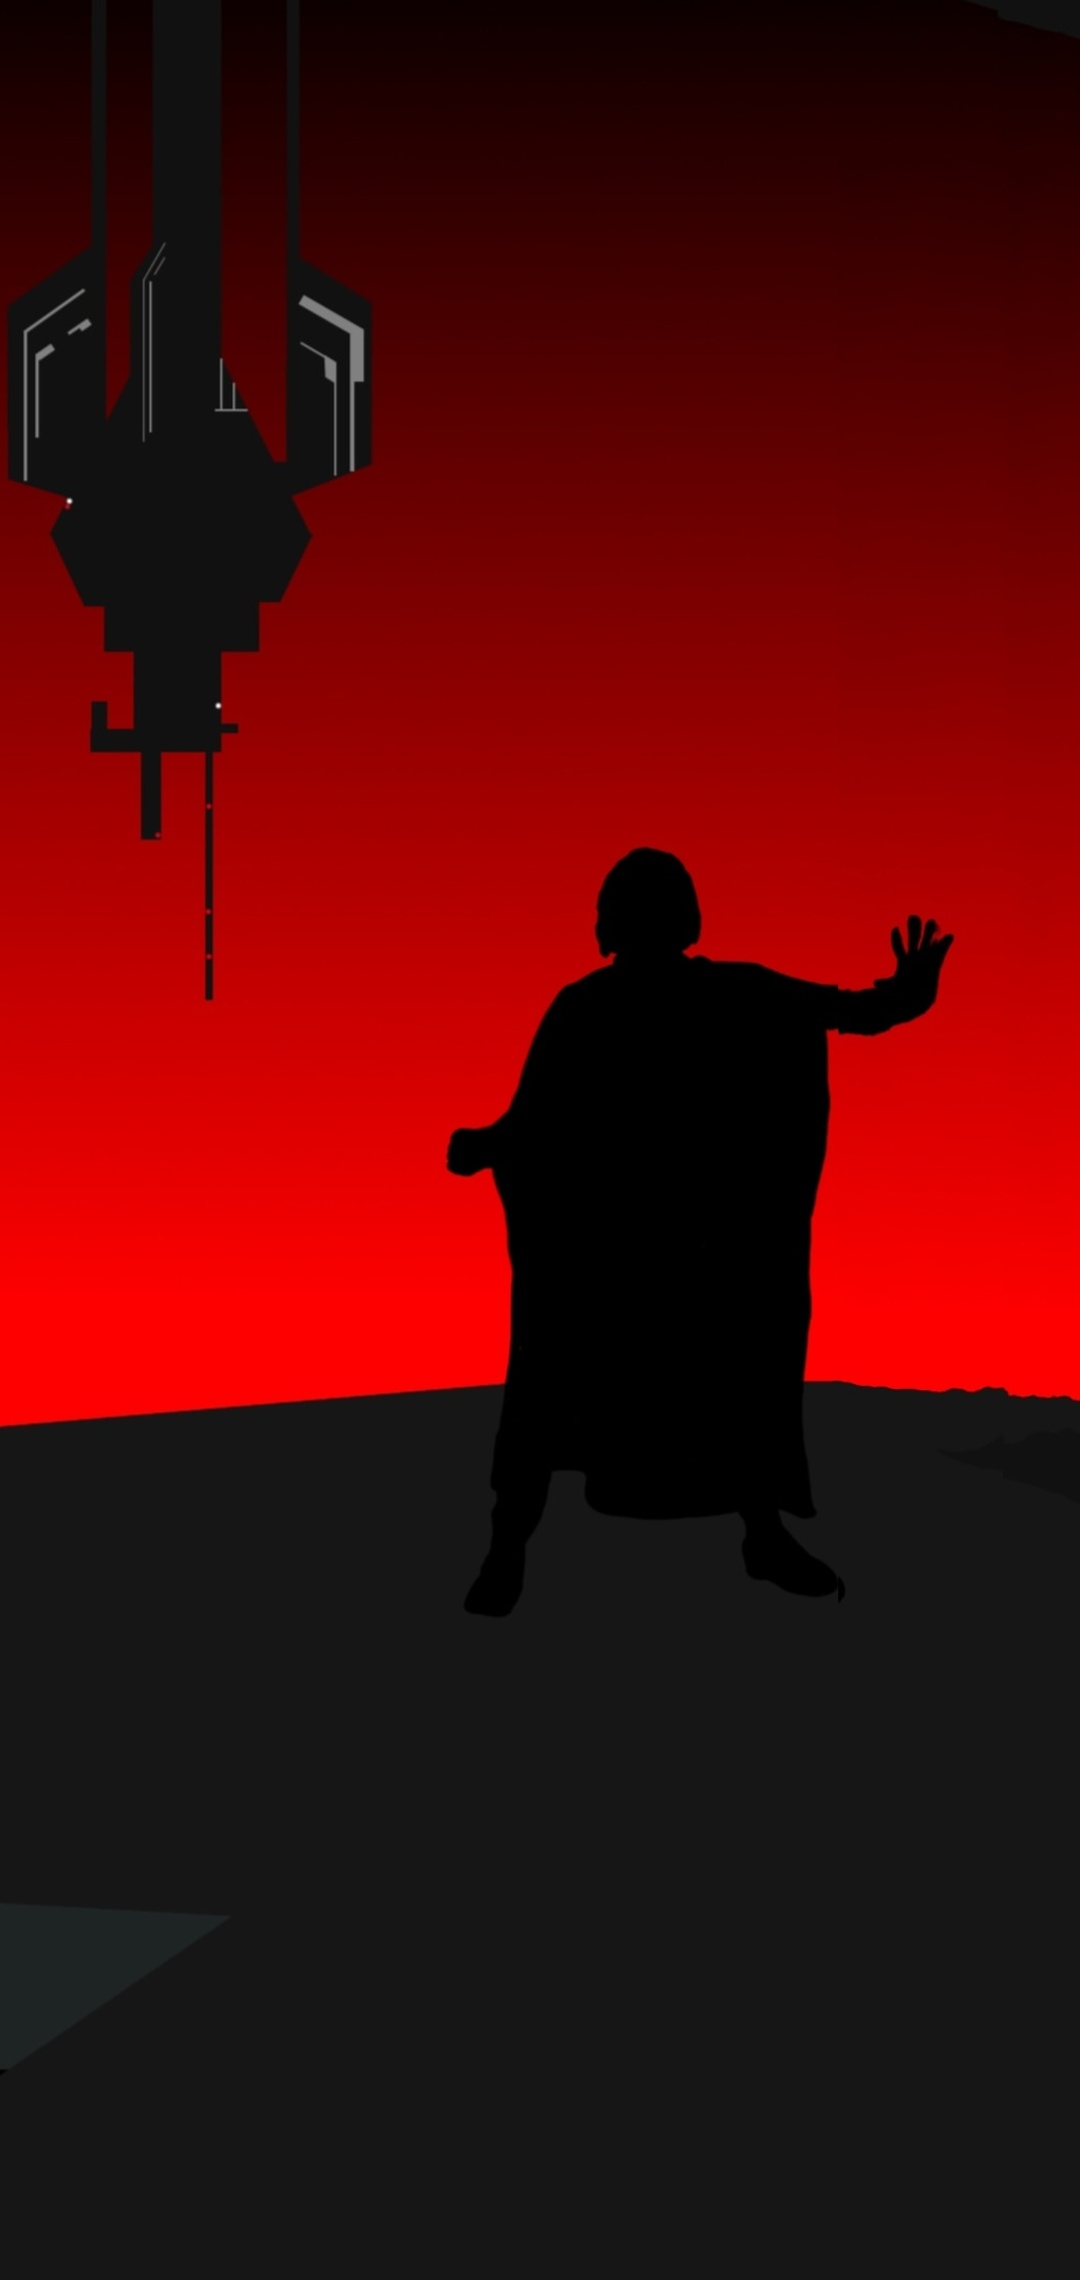 rey-kylo-ren-in-star-wars-the-last-jedi-artwork-5k-ve.jpg